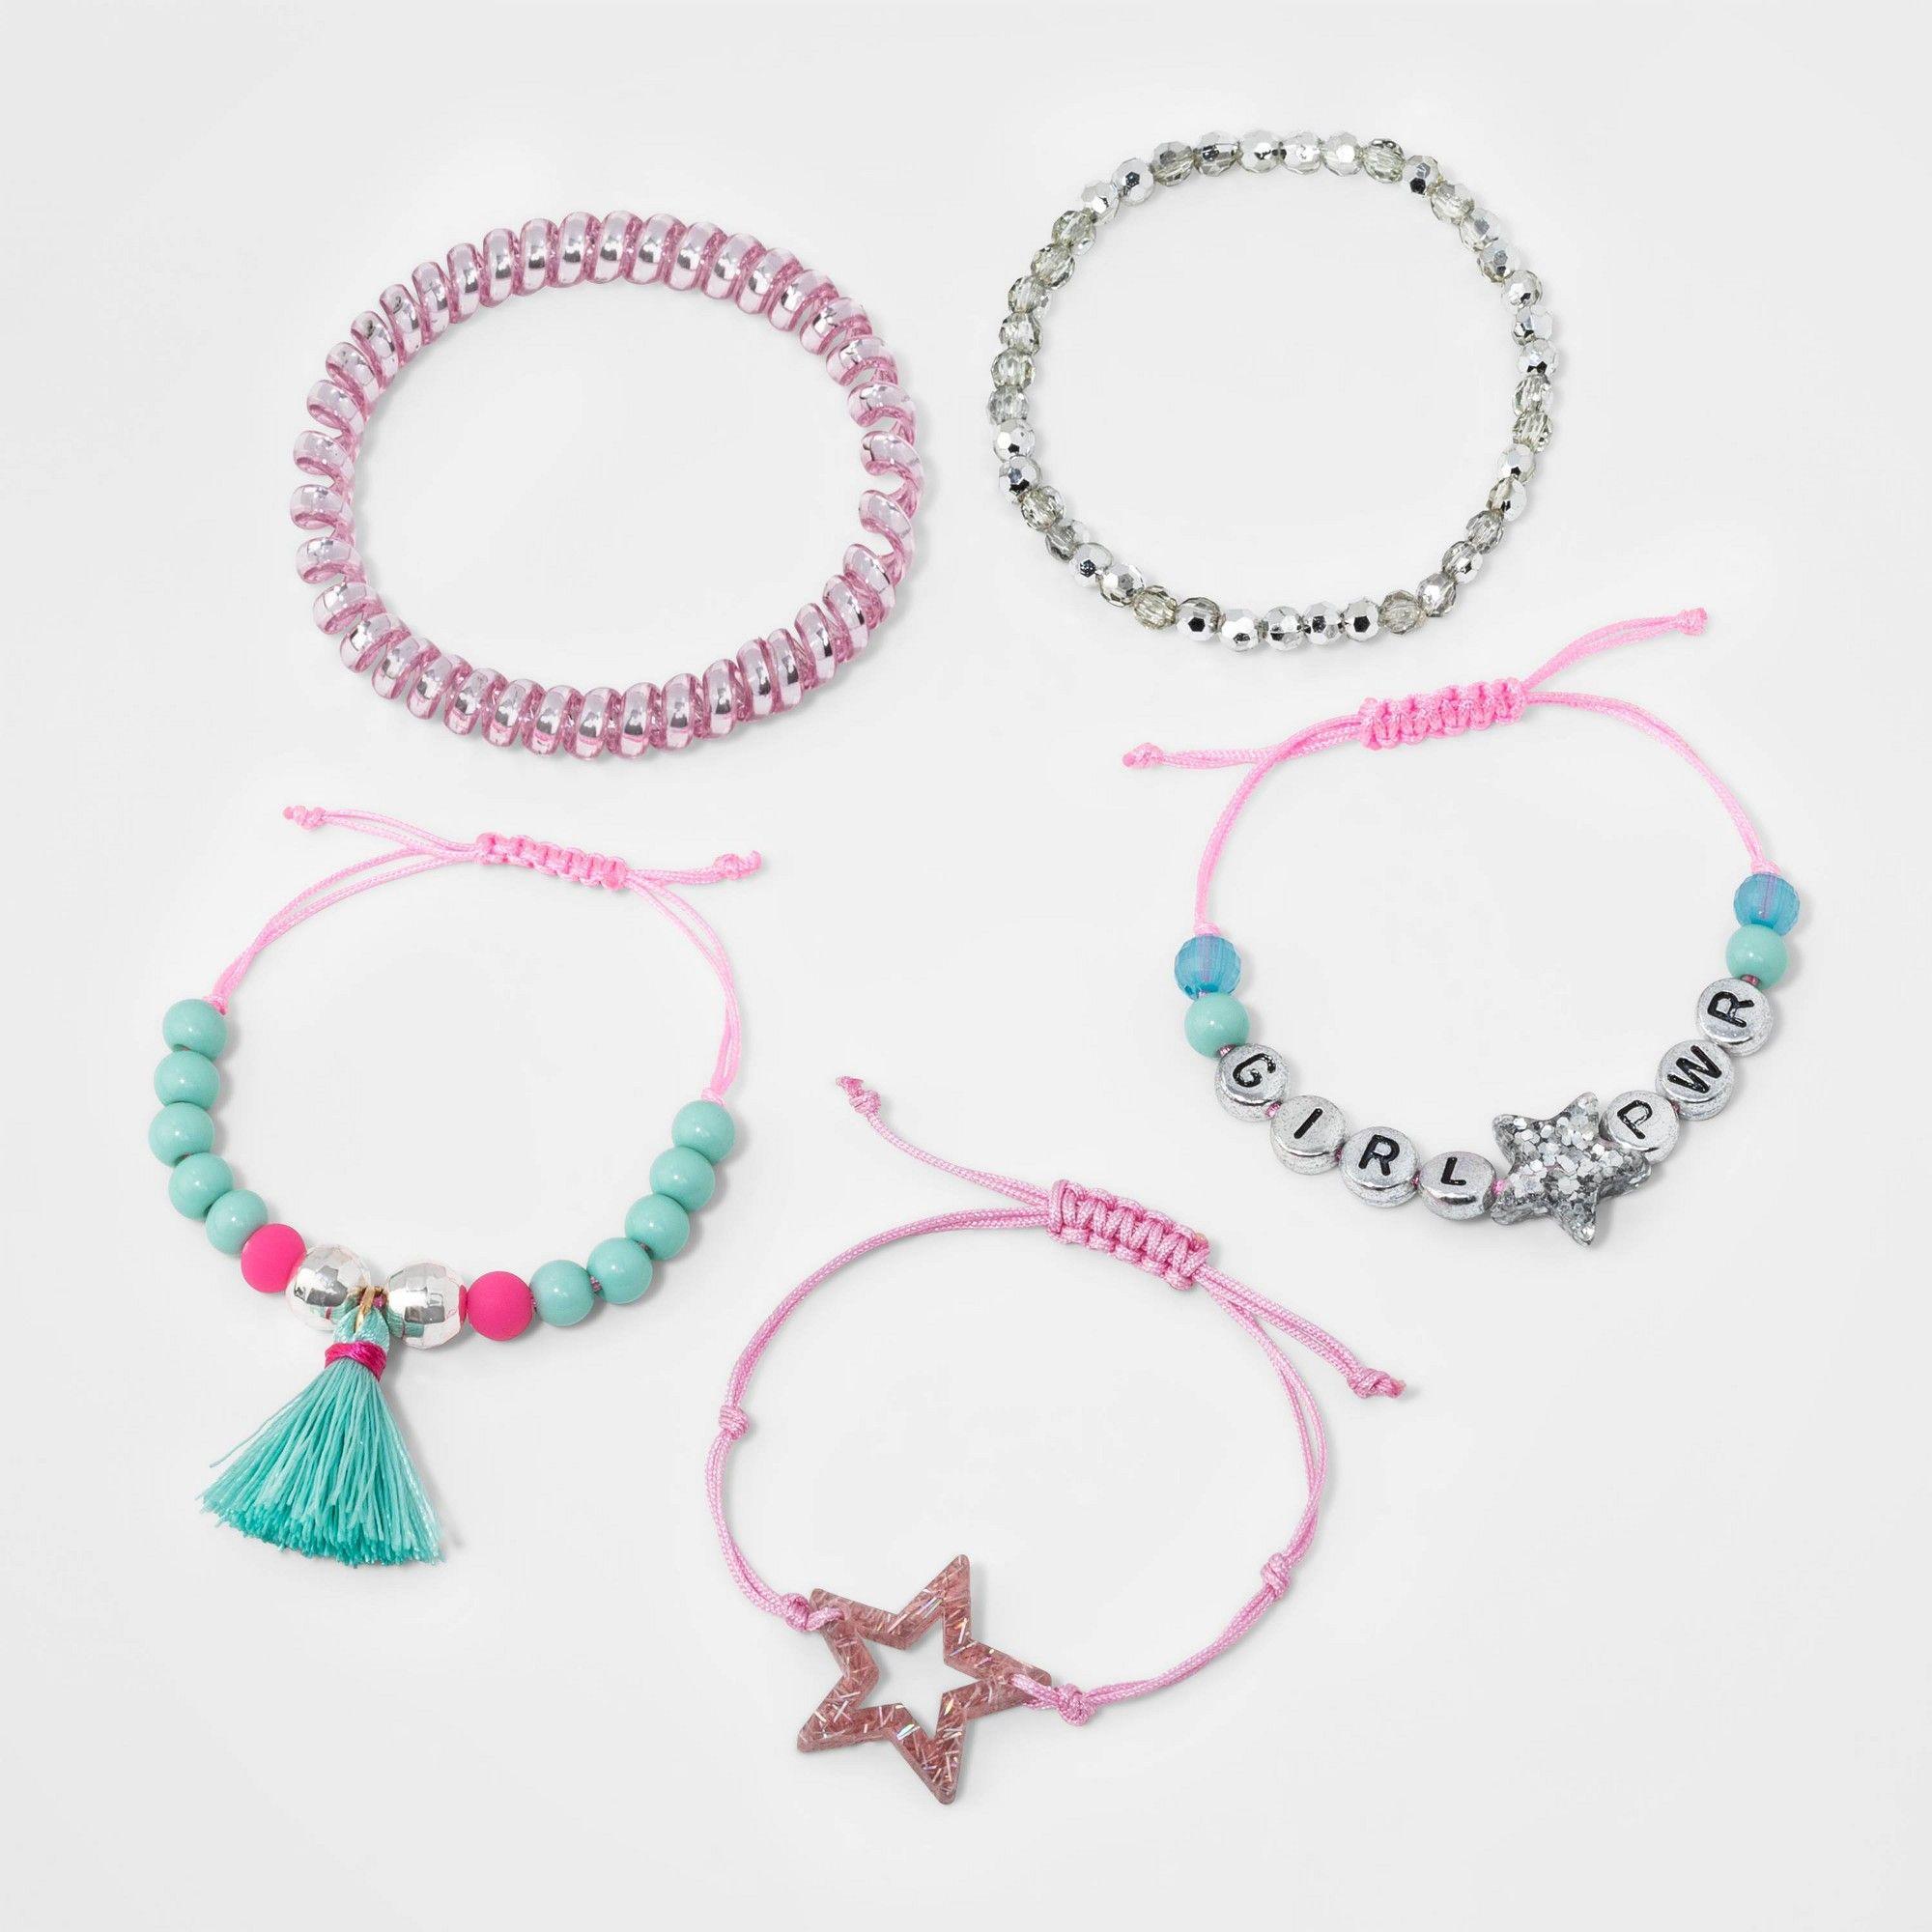 Girls 5pk Girl Power Mixed Bracelet Set Cat Jack Women S Multicolored Pony Bead Bracelets Girl Bracelets Bracelet Set